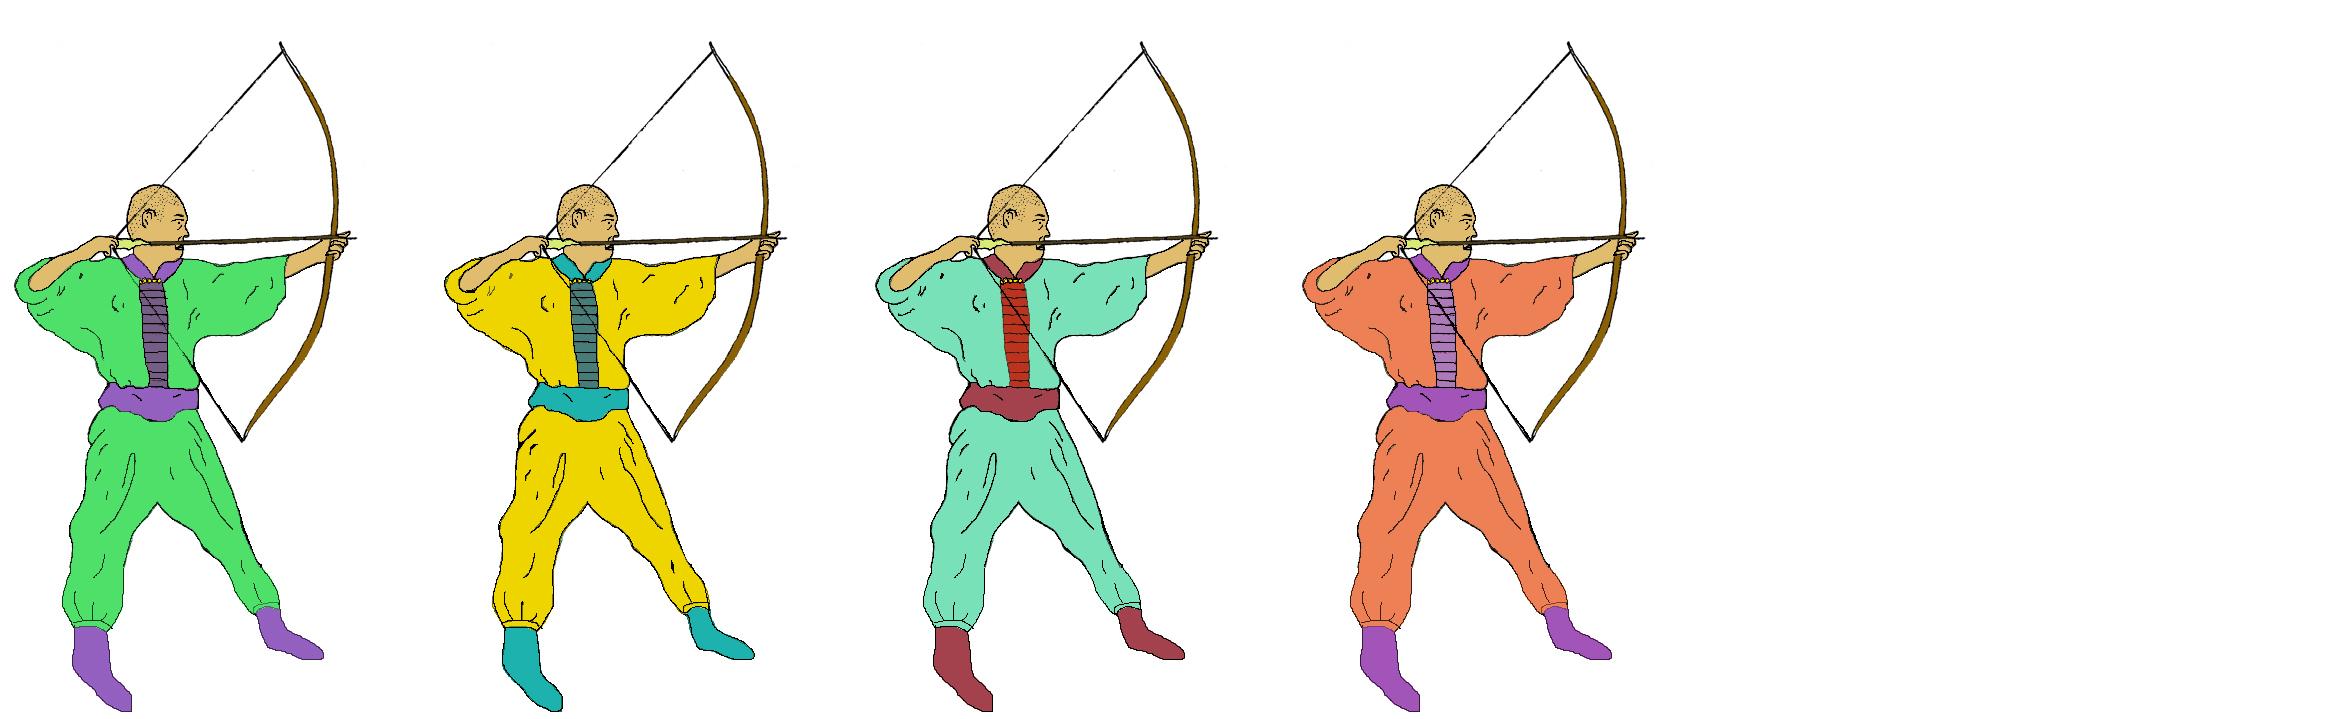 Samurai - Zander B. Abranowicz